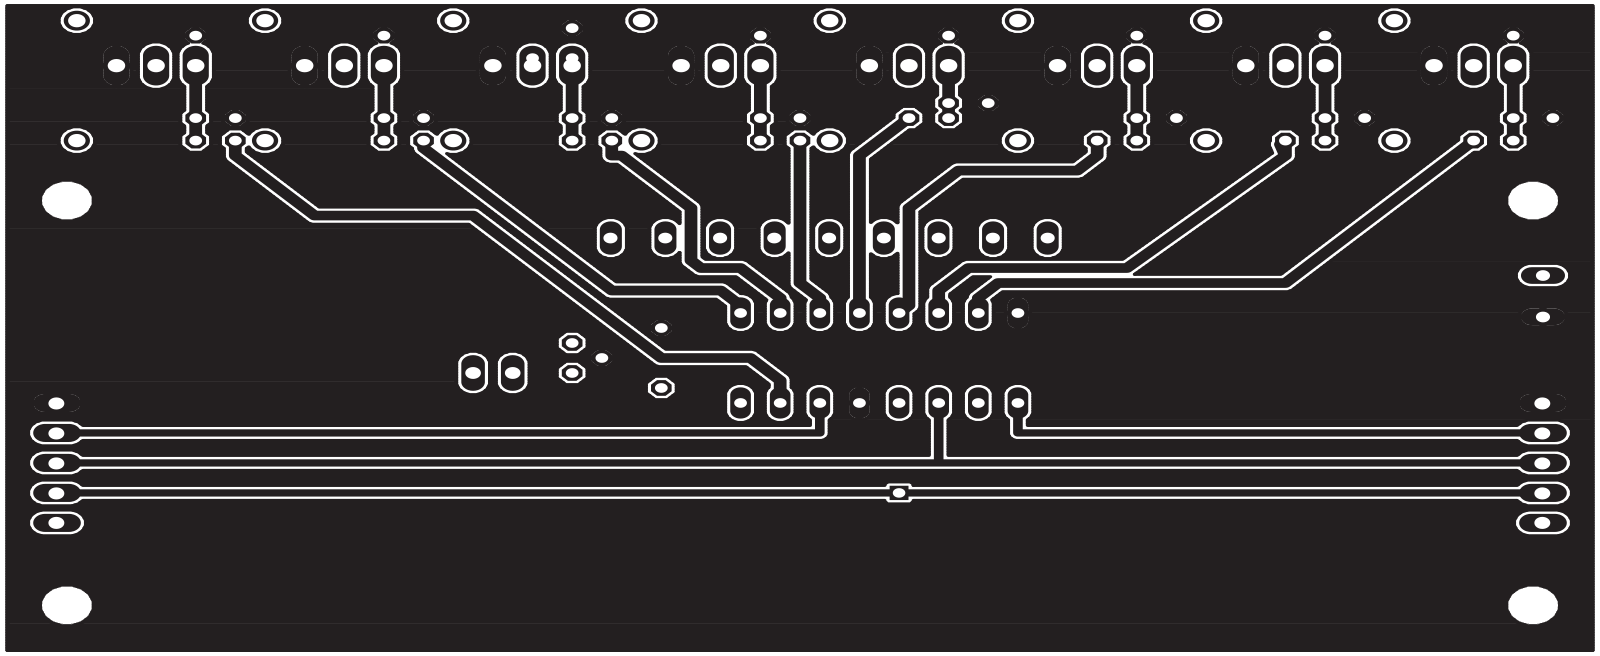 Led Display Circuit Diagram Driving By 74hc595 Basiccircuit